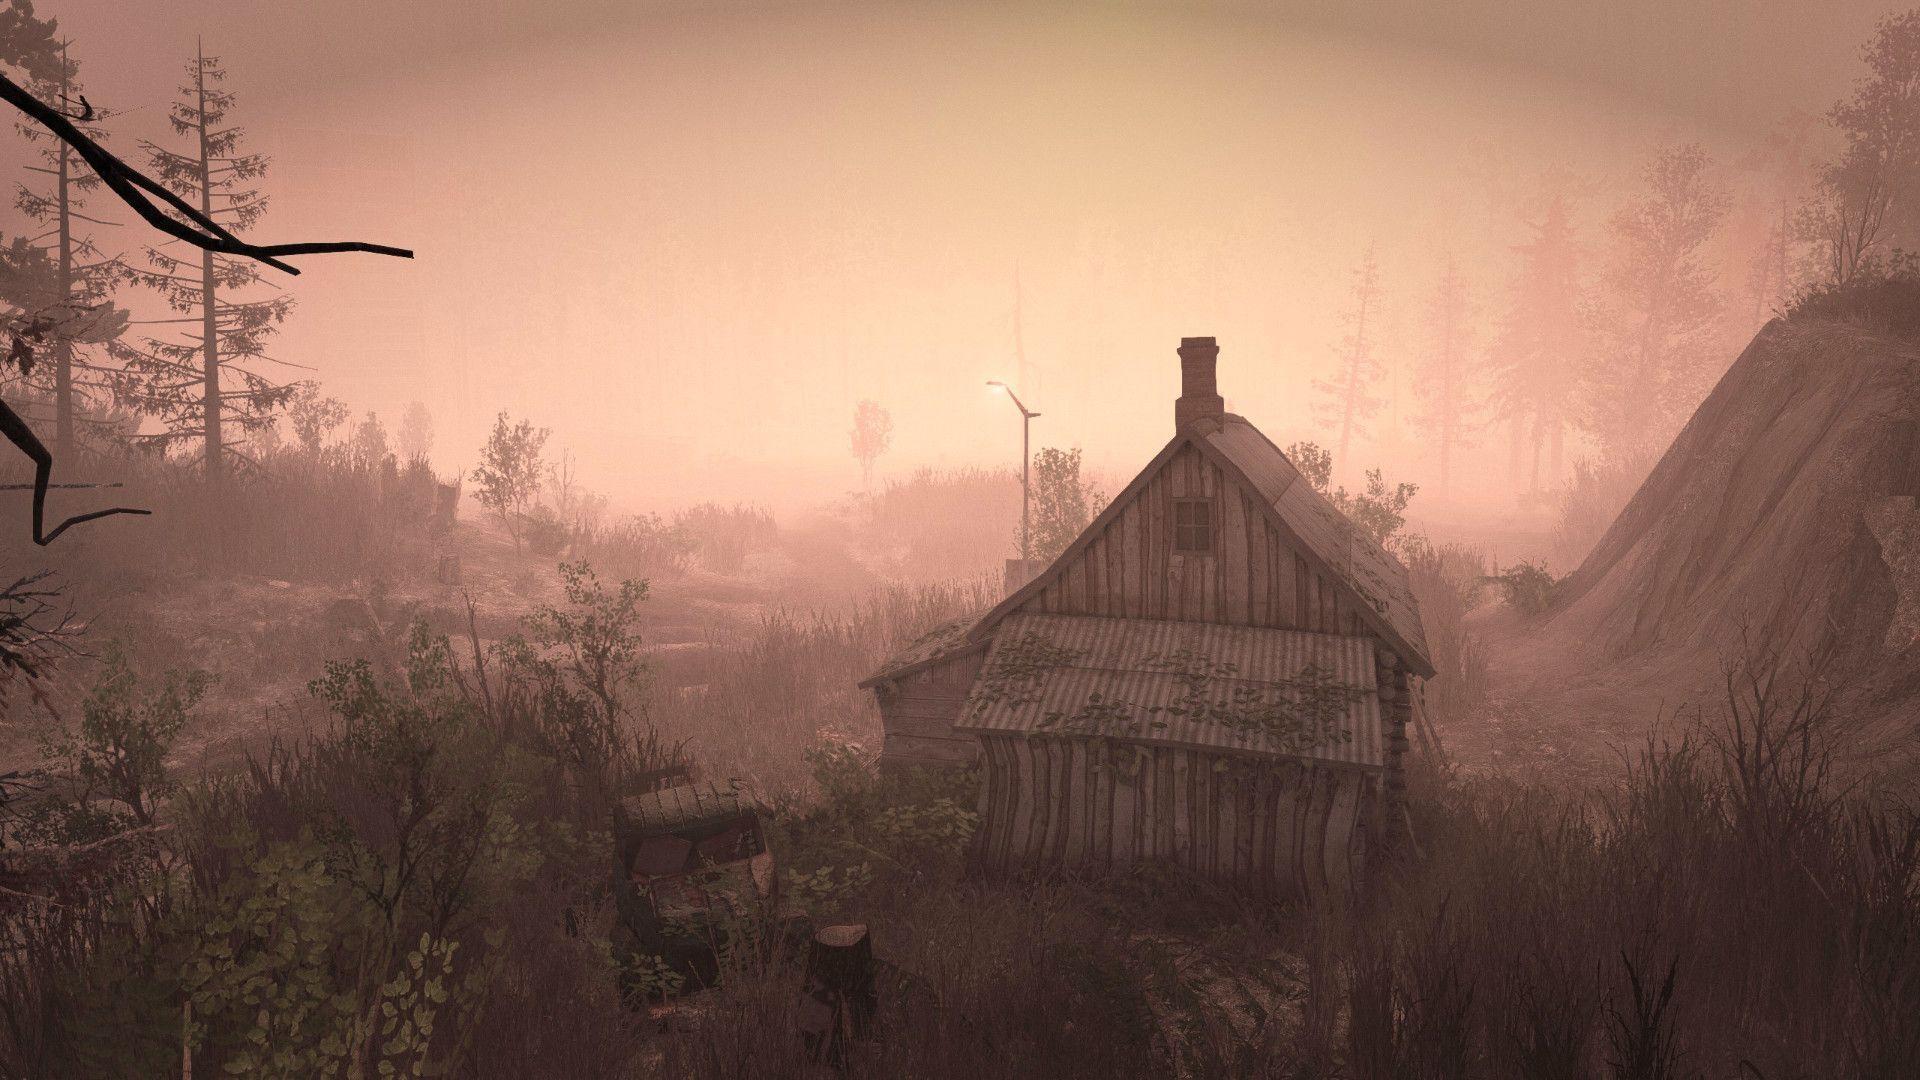 Spintires – DLC Chernobyl foi lançada mundialmente